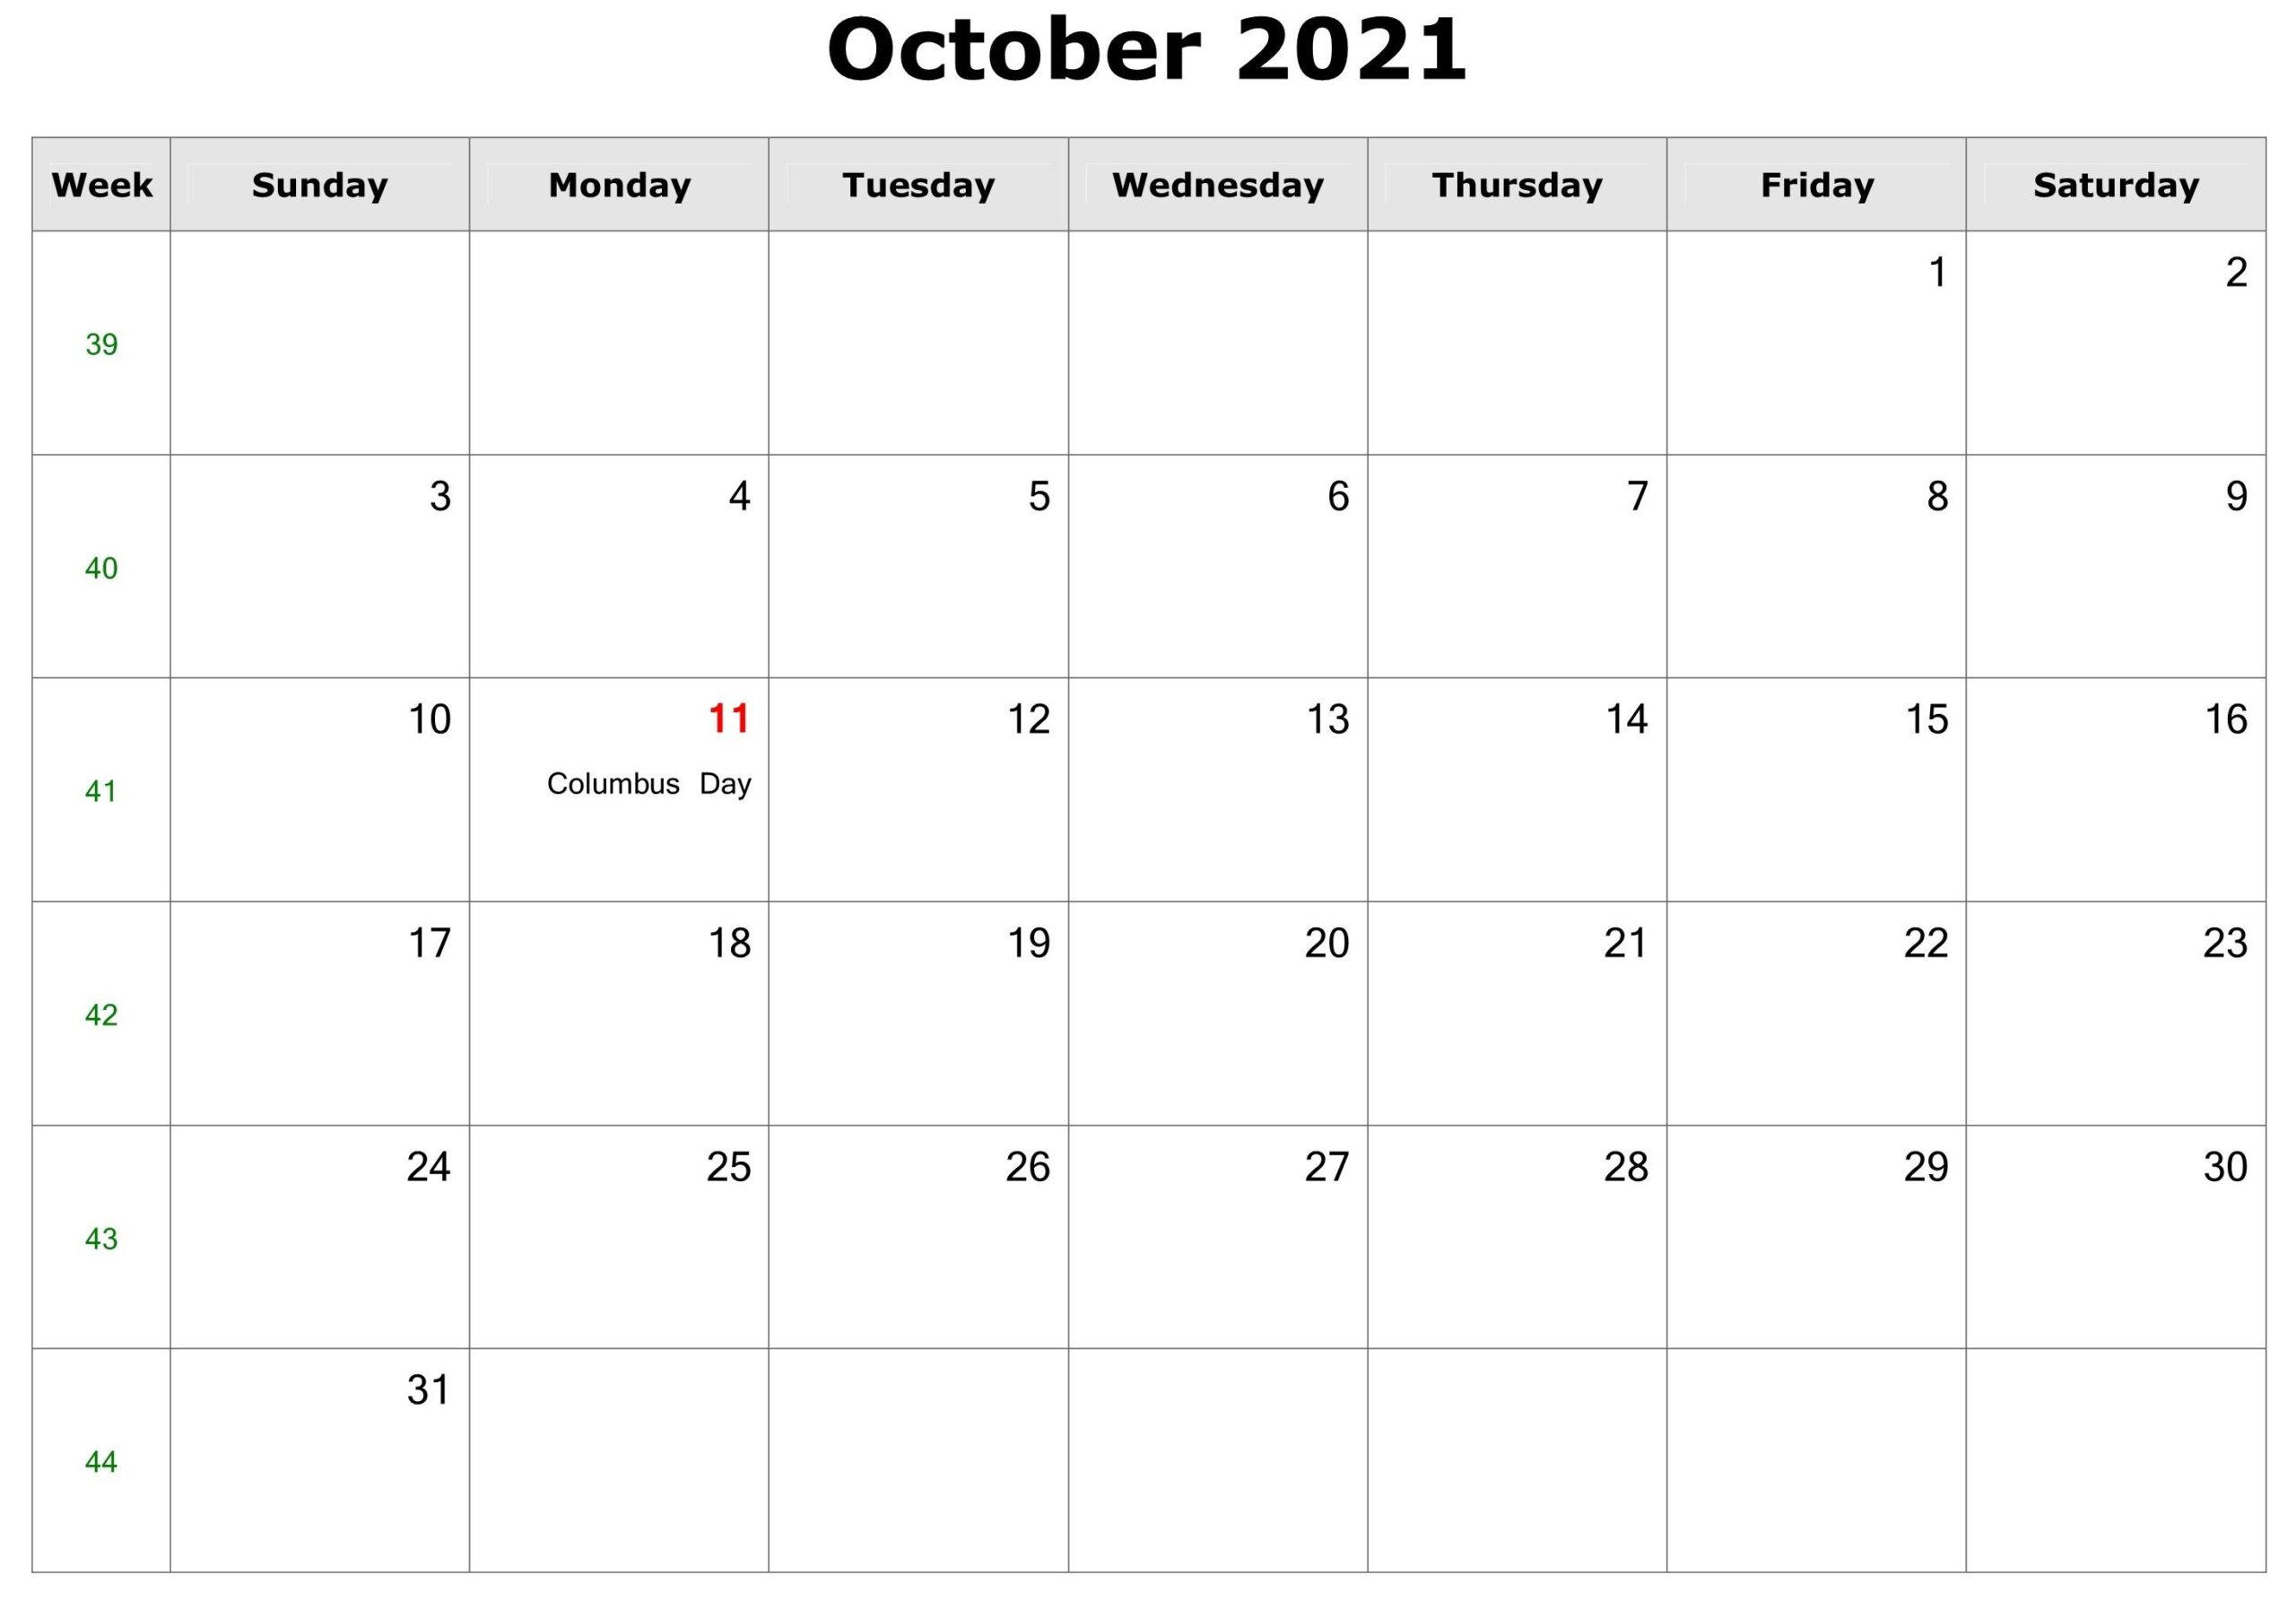 October 2021 Calendar - Free Download Printable Calendar  Full Page Printable Monthly Calendar 2021